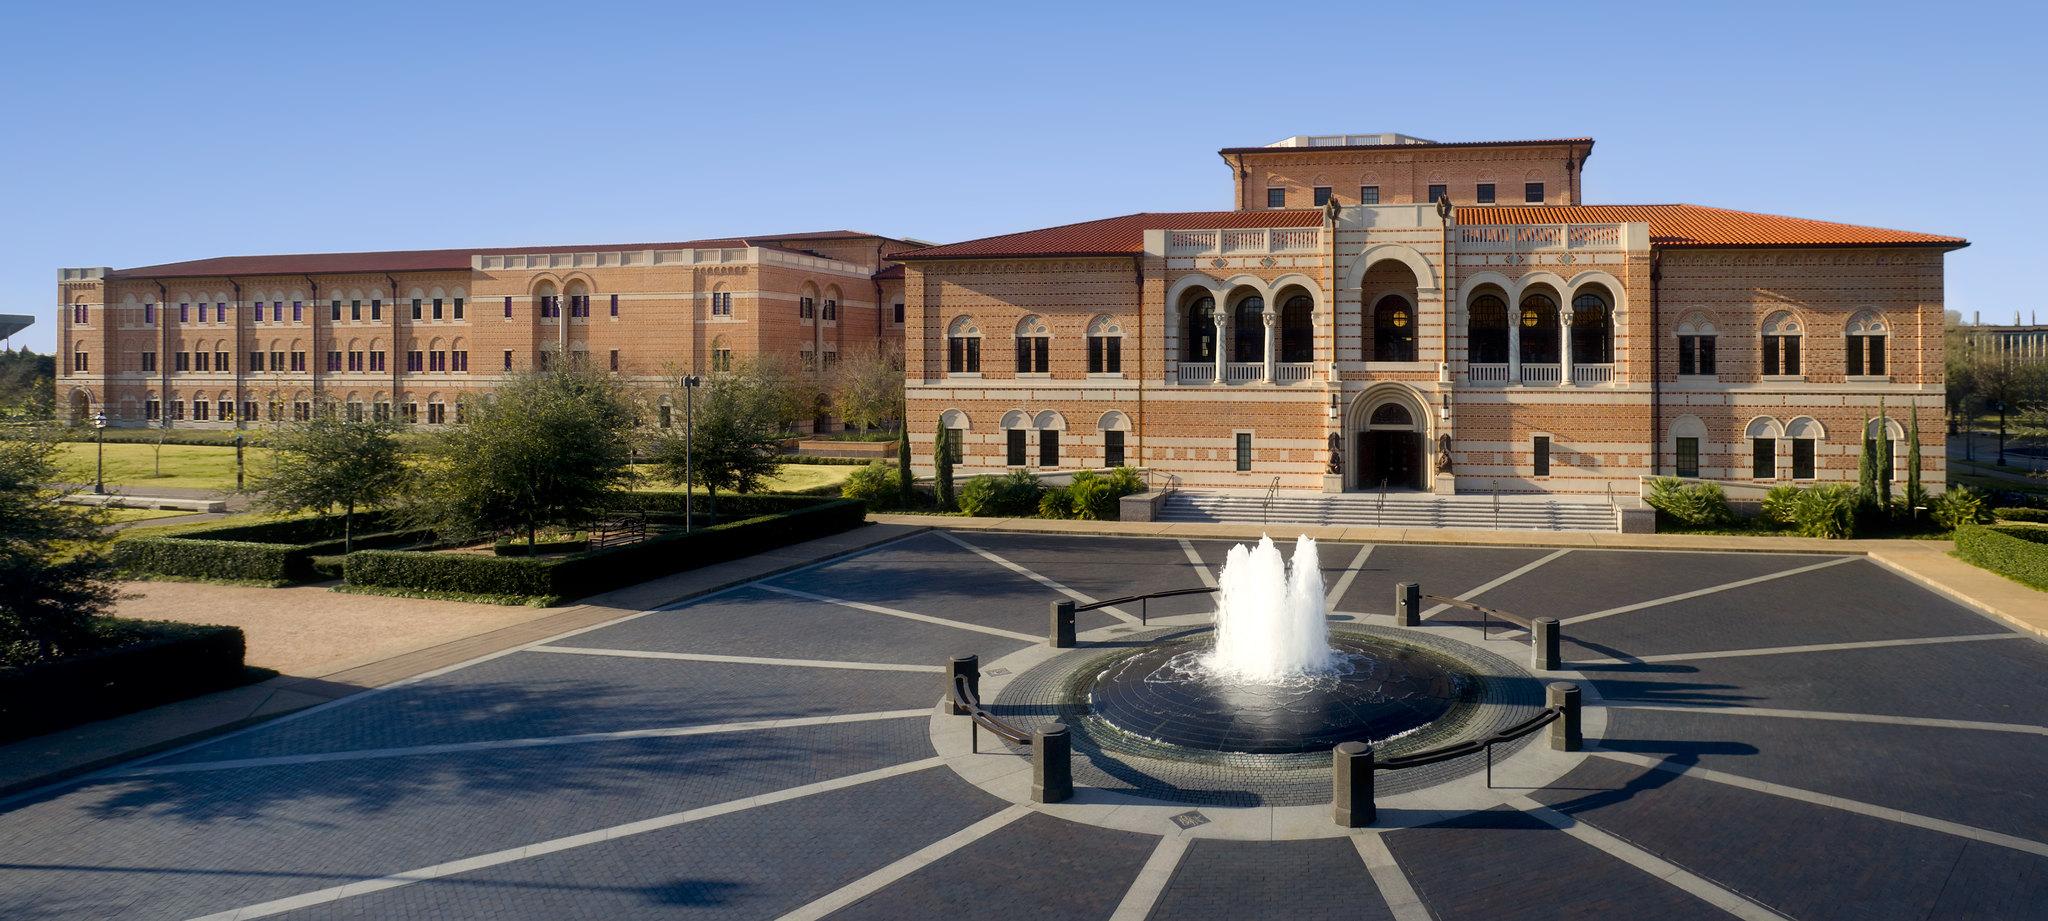 western michigan university dissertations